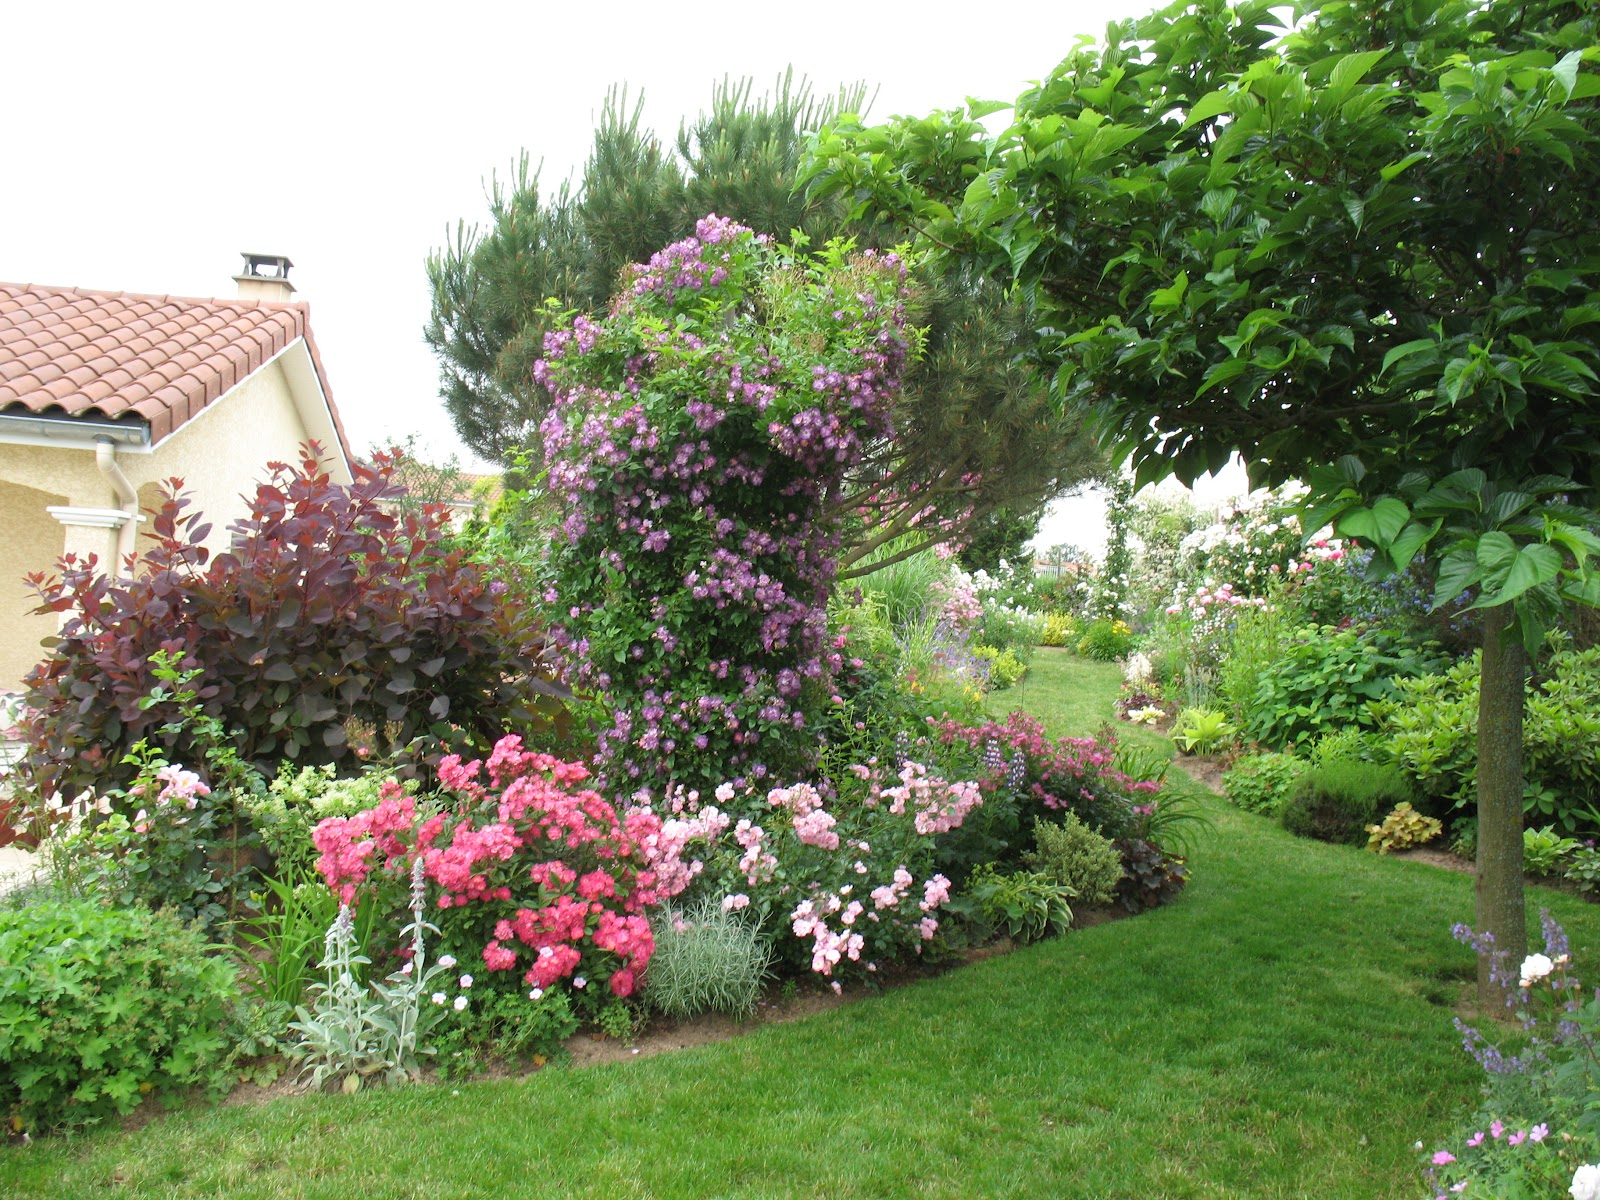 Accueil rosiers rosier rose osiria rose bed mattress sale - Rouille rosier traitement naturel ...